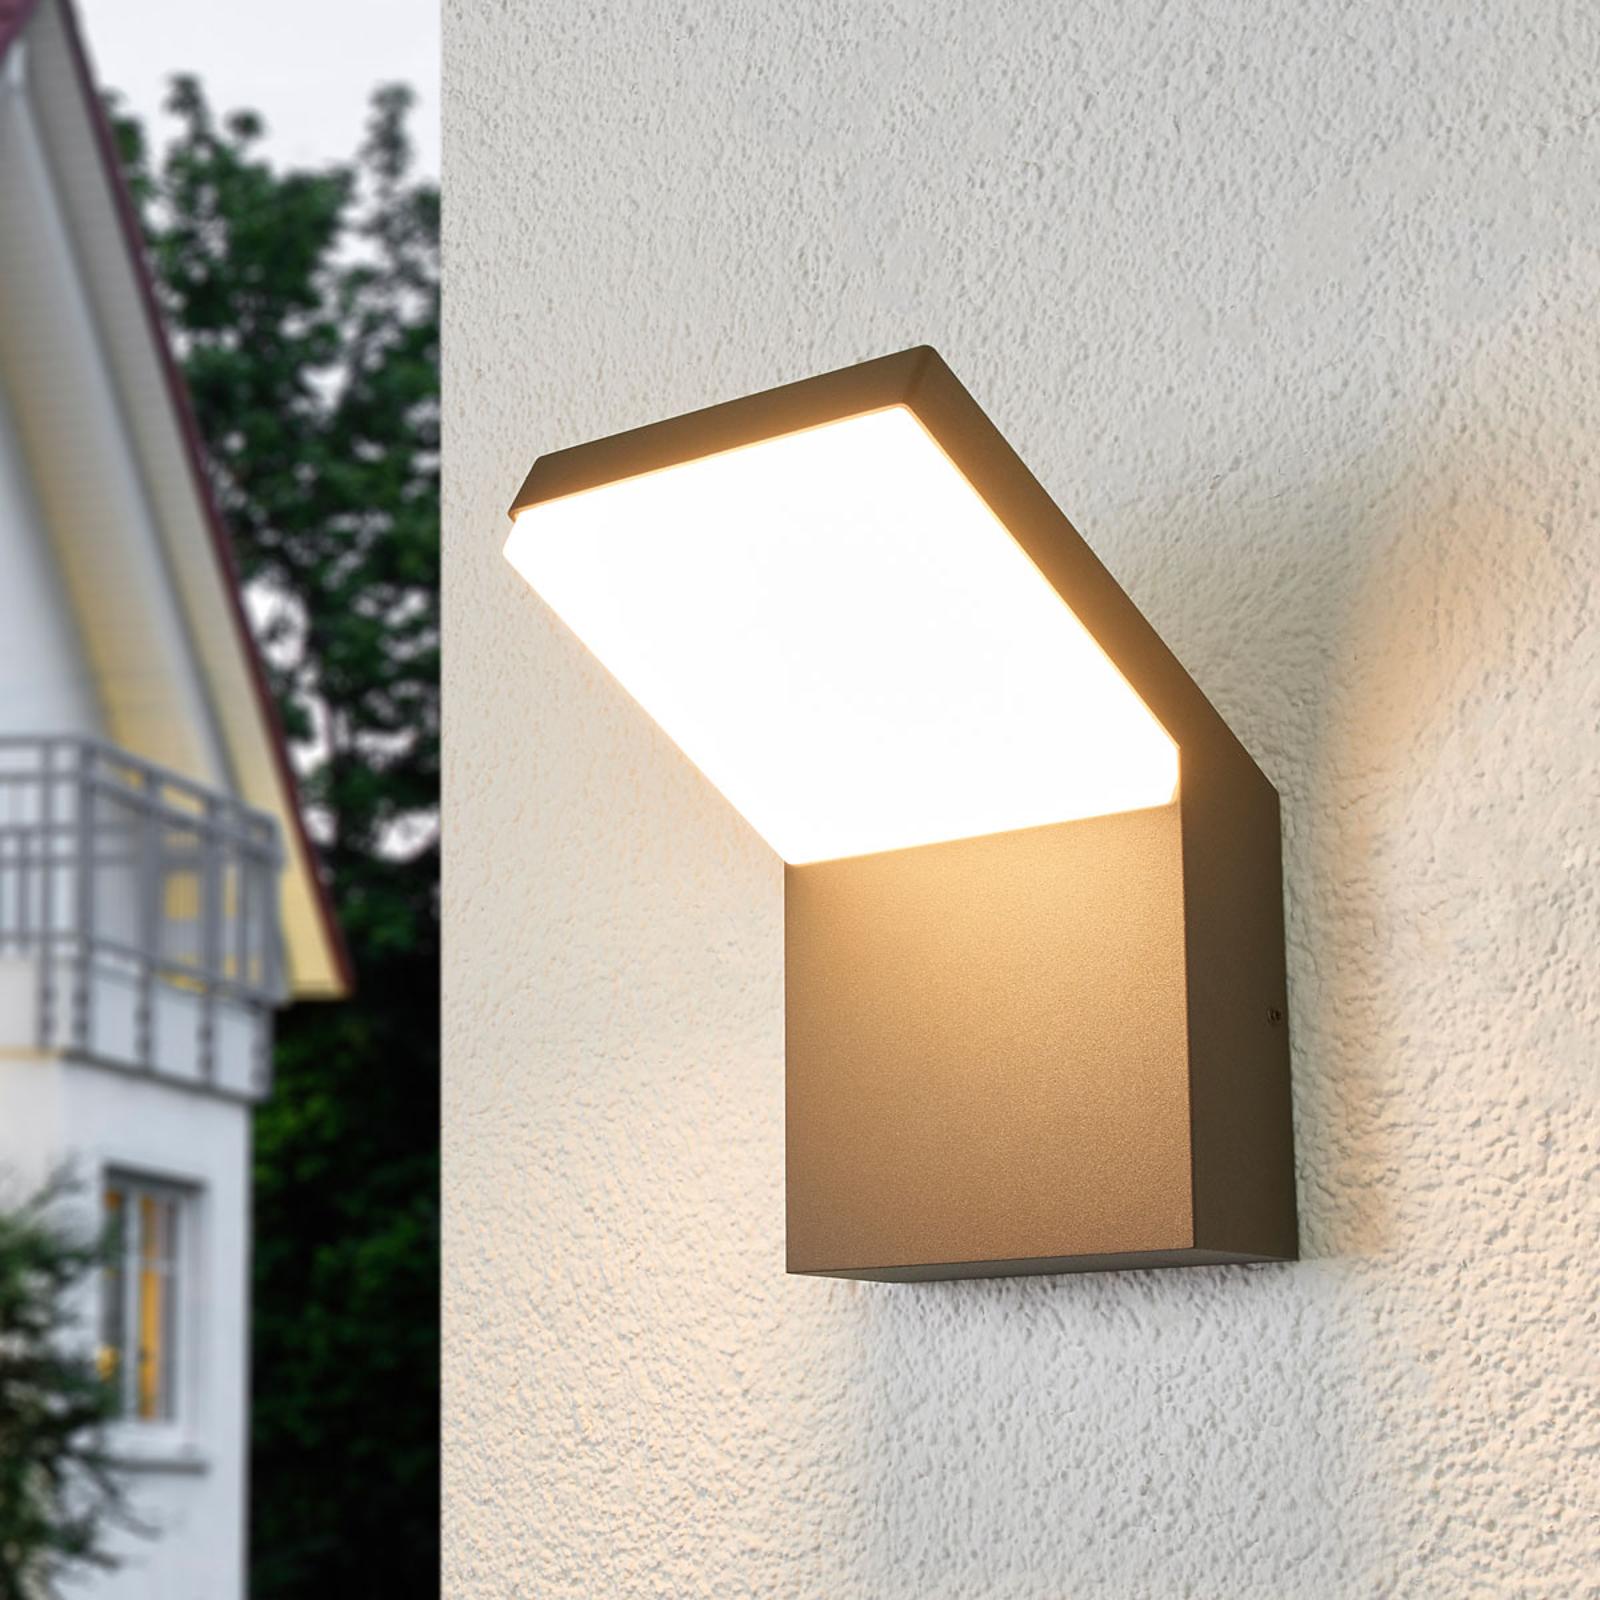 LED-utevegglampe Yolena nedadrettet